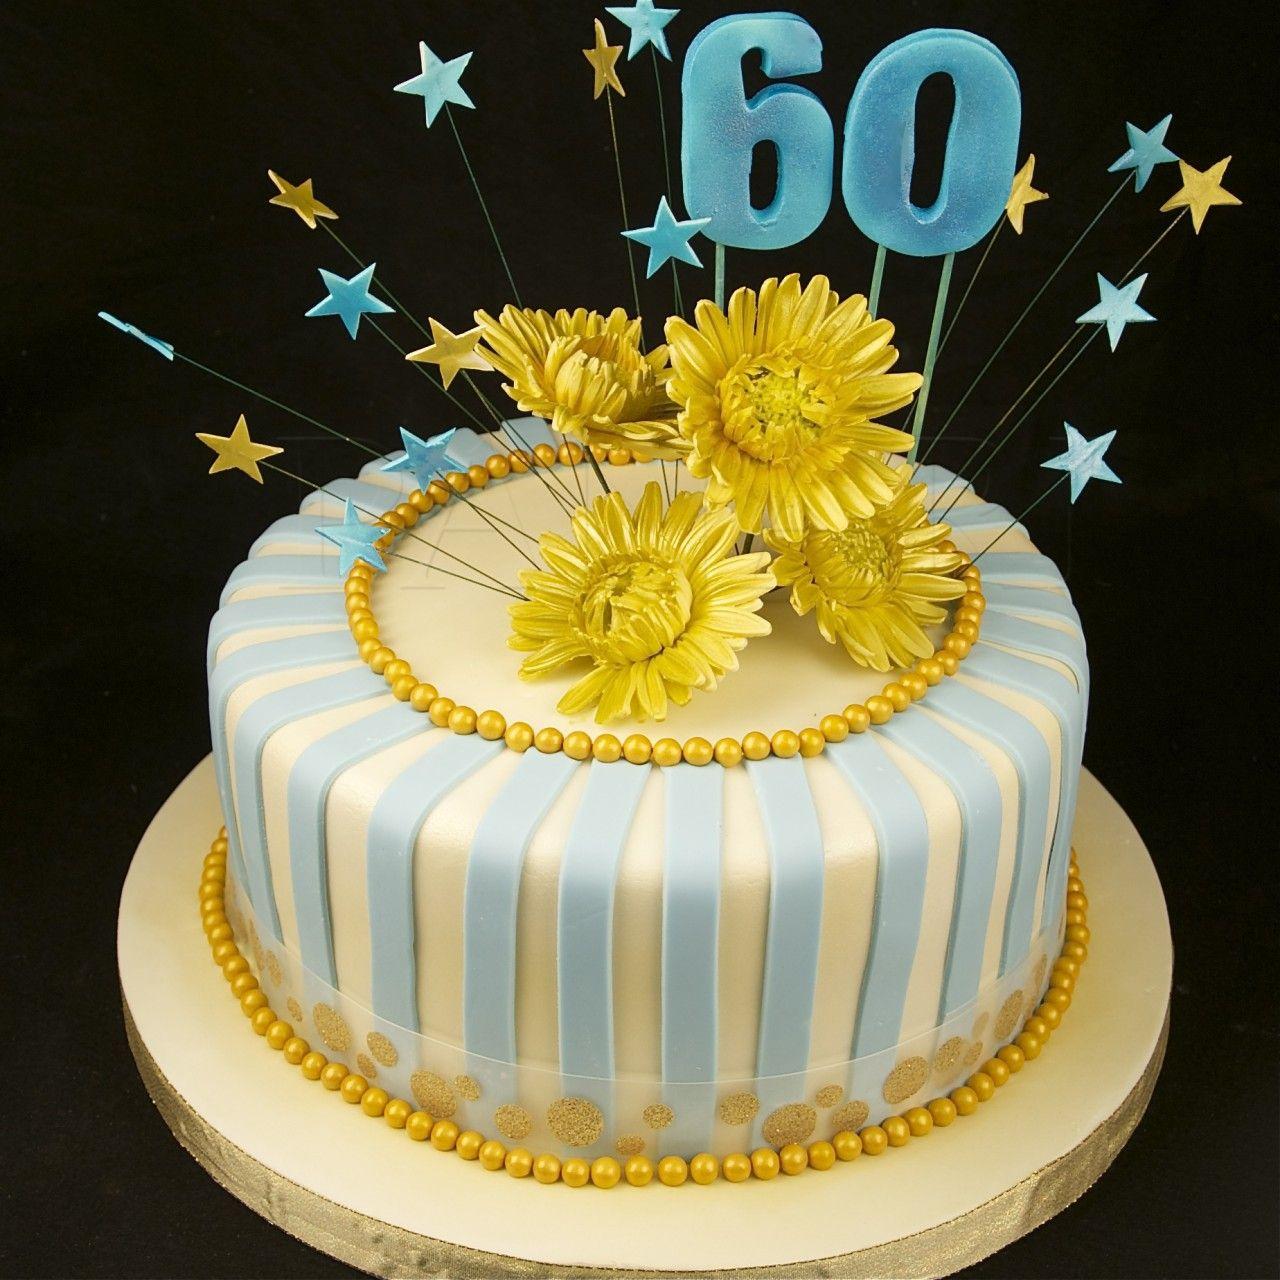 Askcom Brunch Ideas Pinterest 60th birthday cakes 60th